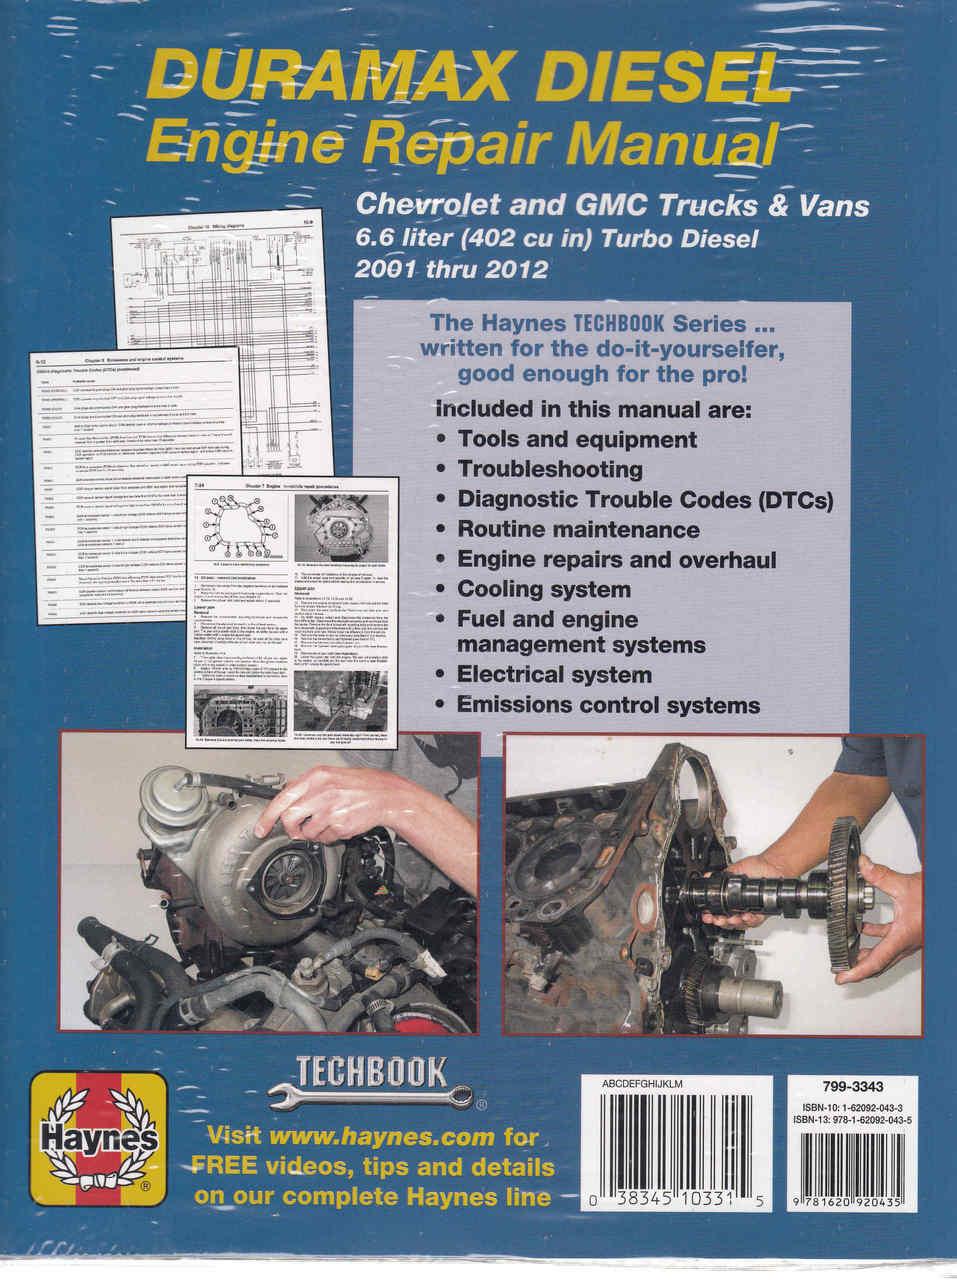 2001 chevrolet silverado 2500hd repair manual